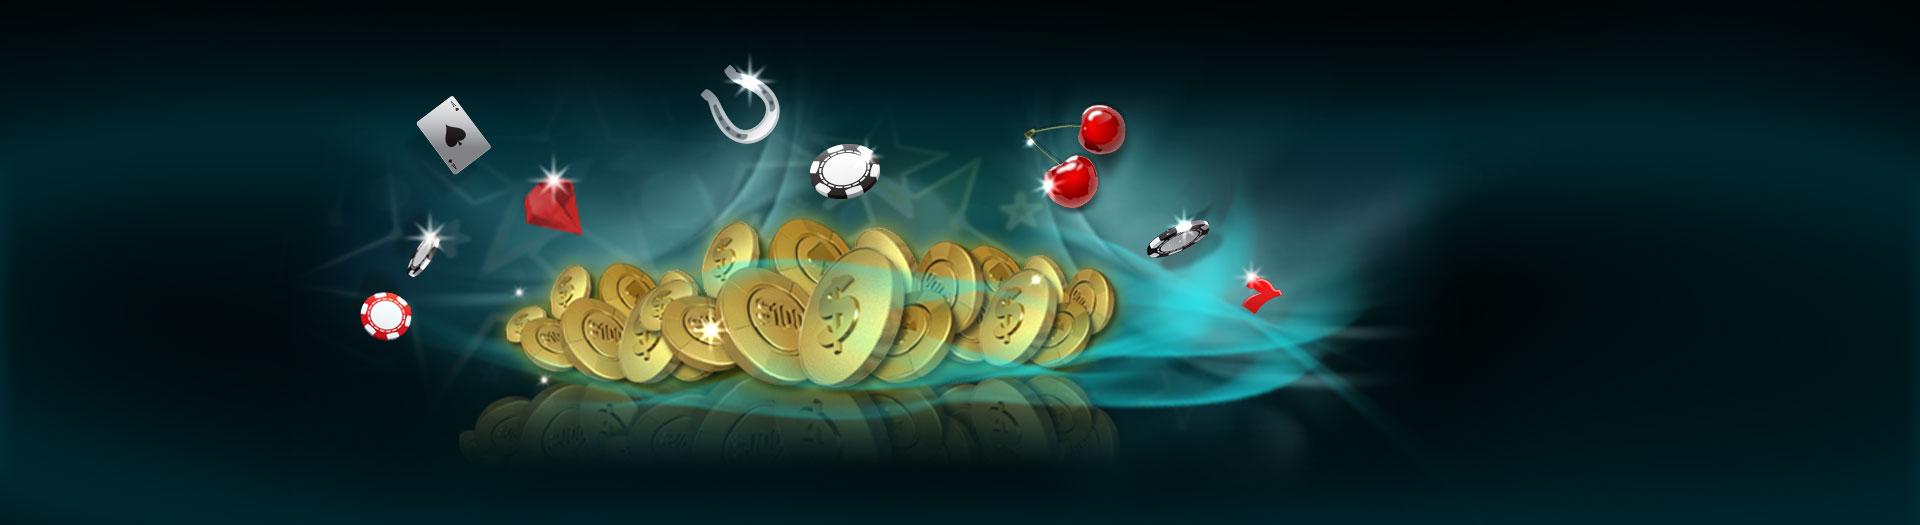 888 casino promotions el Gordo online-778180